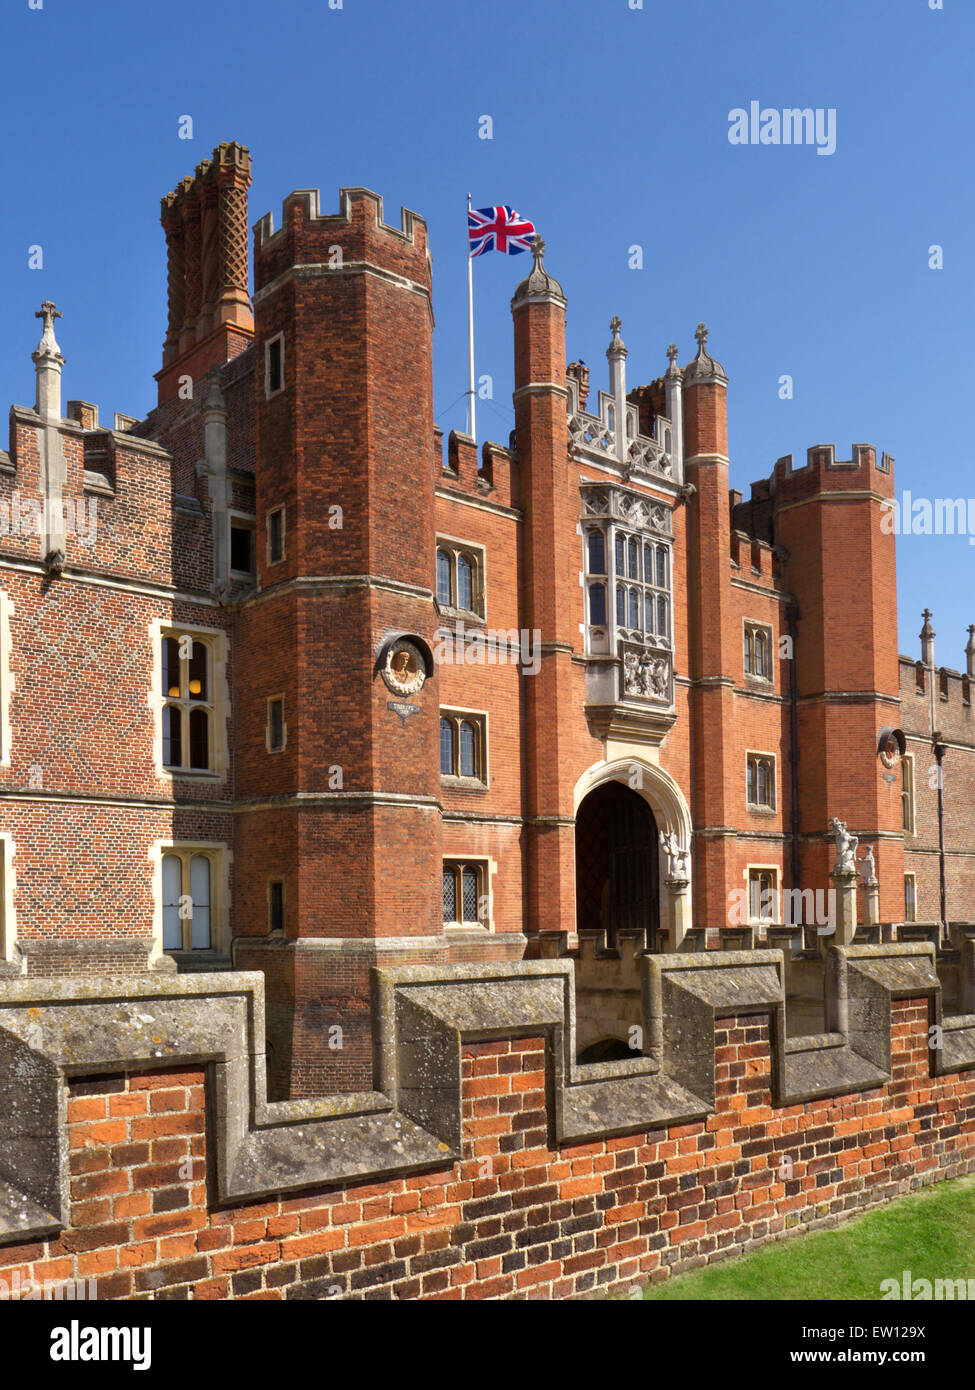 Hampton Court Palace a Royal Palace in London Borough of Richmond upon Thames Greater London Surrey UK Immagini Stock